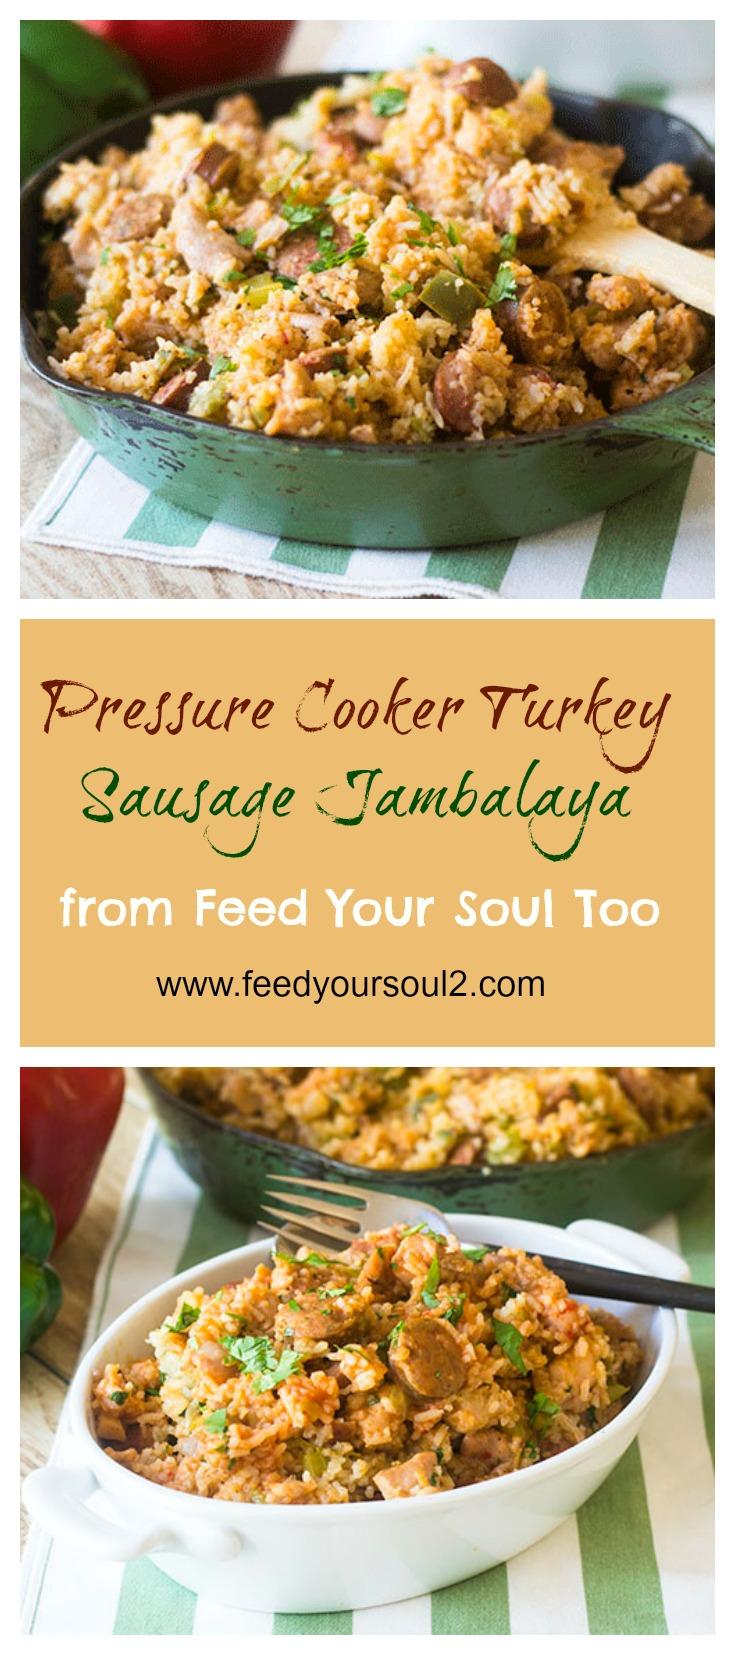 Pressure Cooker Chicken Sausage Jambalaya #Pressurecooker #Cajun #chicken #dinner | feedyoursoul2.com